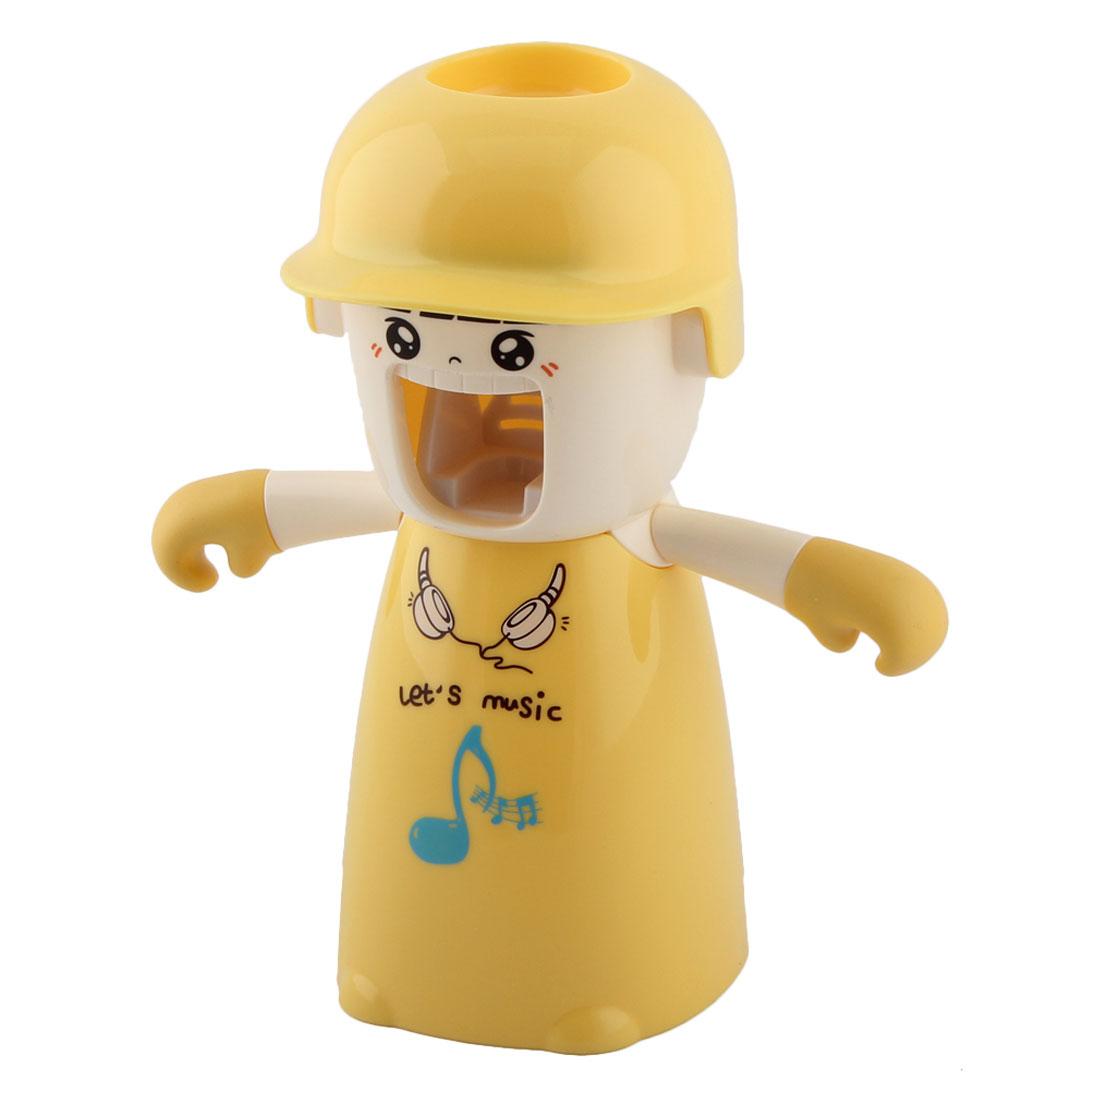 Bathroom Plastic Cartoon Girl Pattern Automatic Toothpaste Dispenser Squeezer Storage Cup Holder Rack Yellow Set 4 in 1